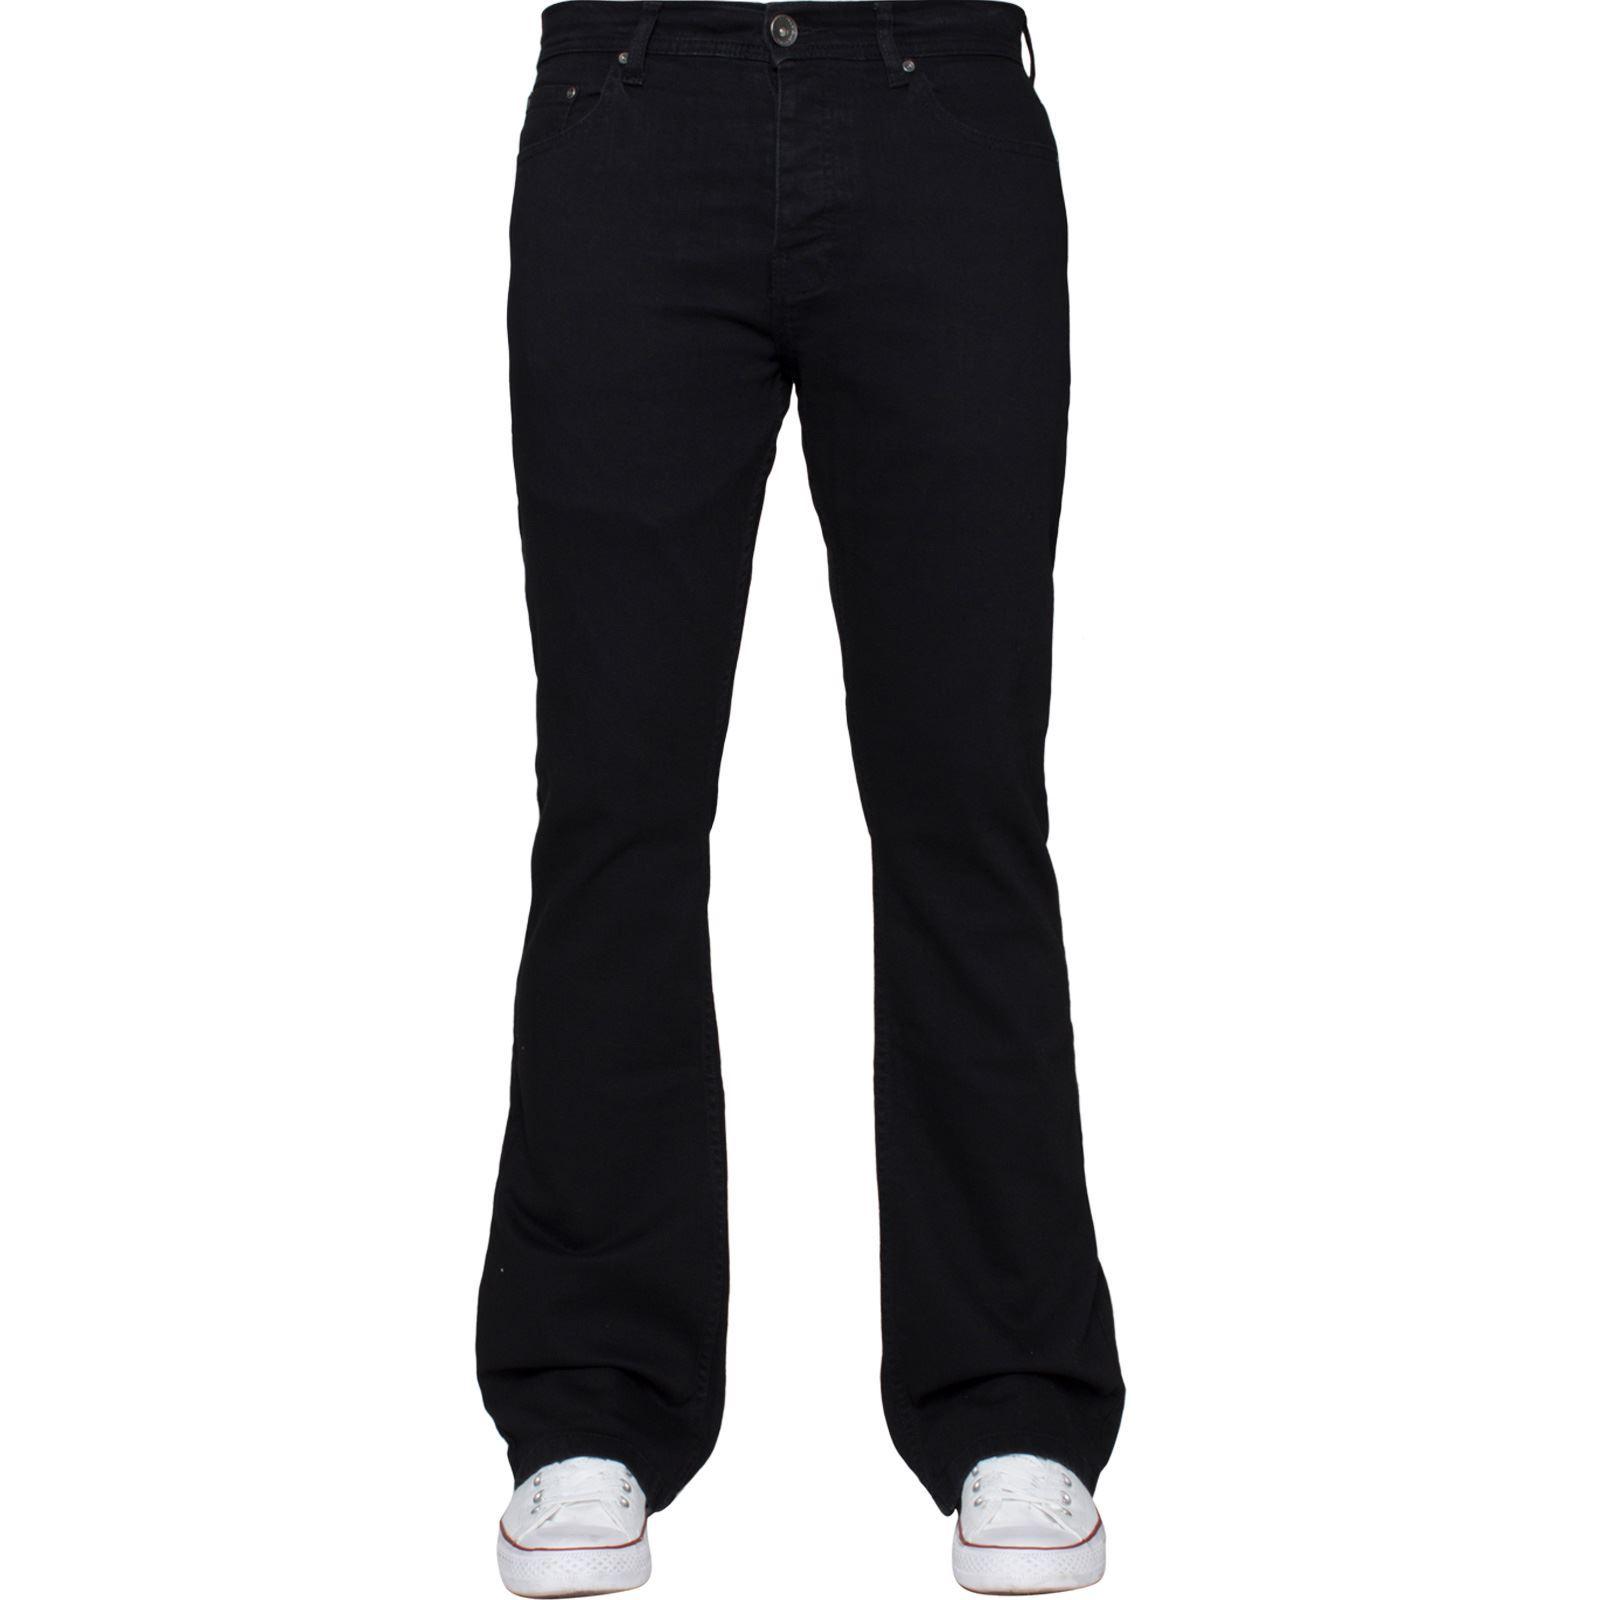 Para-Hombre-Pierna-Recta-Bootcut-Stretch-Denim-Regulares-Pantalon-de-trabajo-Kruze-Todas-Cinturas miniatura 69